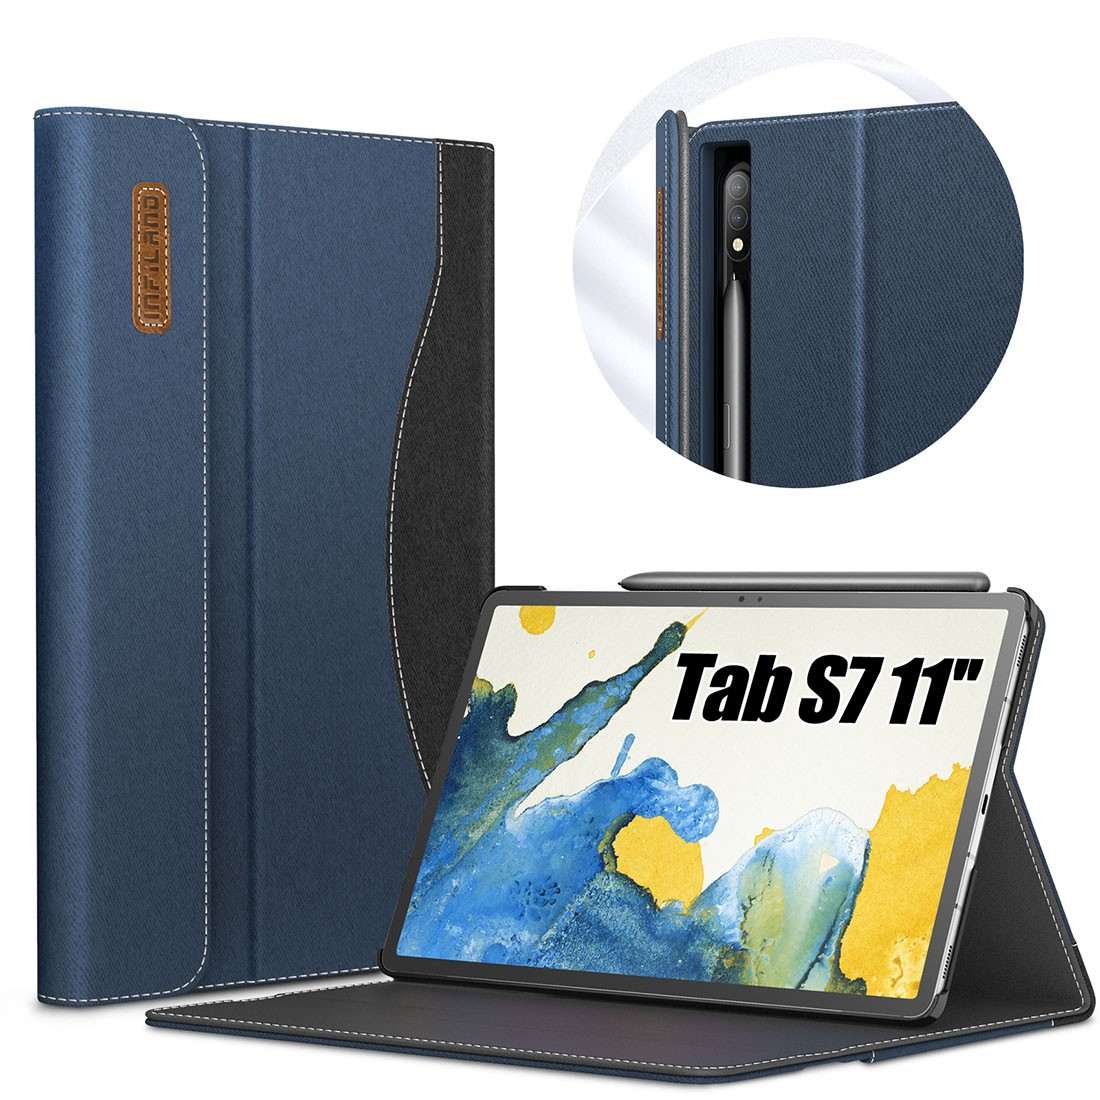 Capa Premium Business Series Samsung Galaxy Tab S7 11 pol SM-T870 e SM-T875